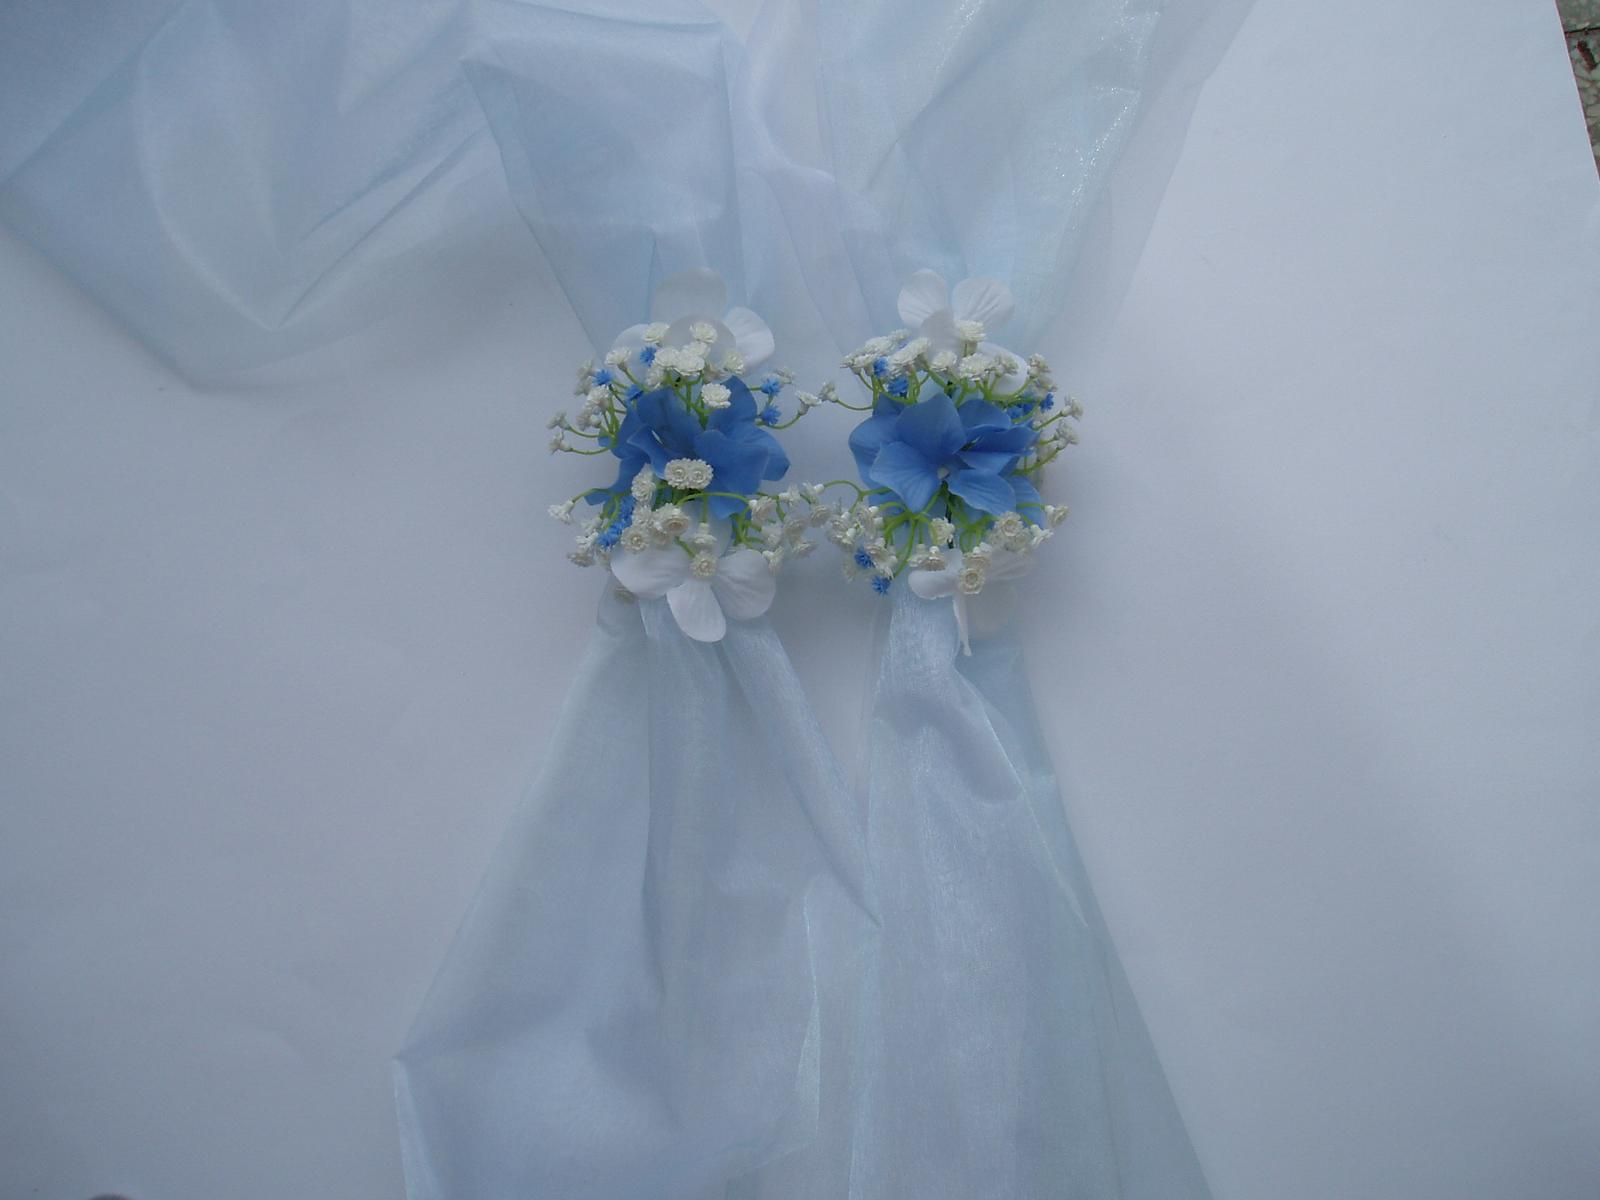 dvojšerpa modro-bílá - Obrázek č. 1